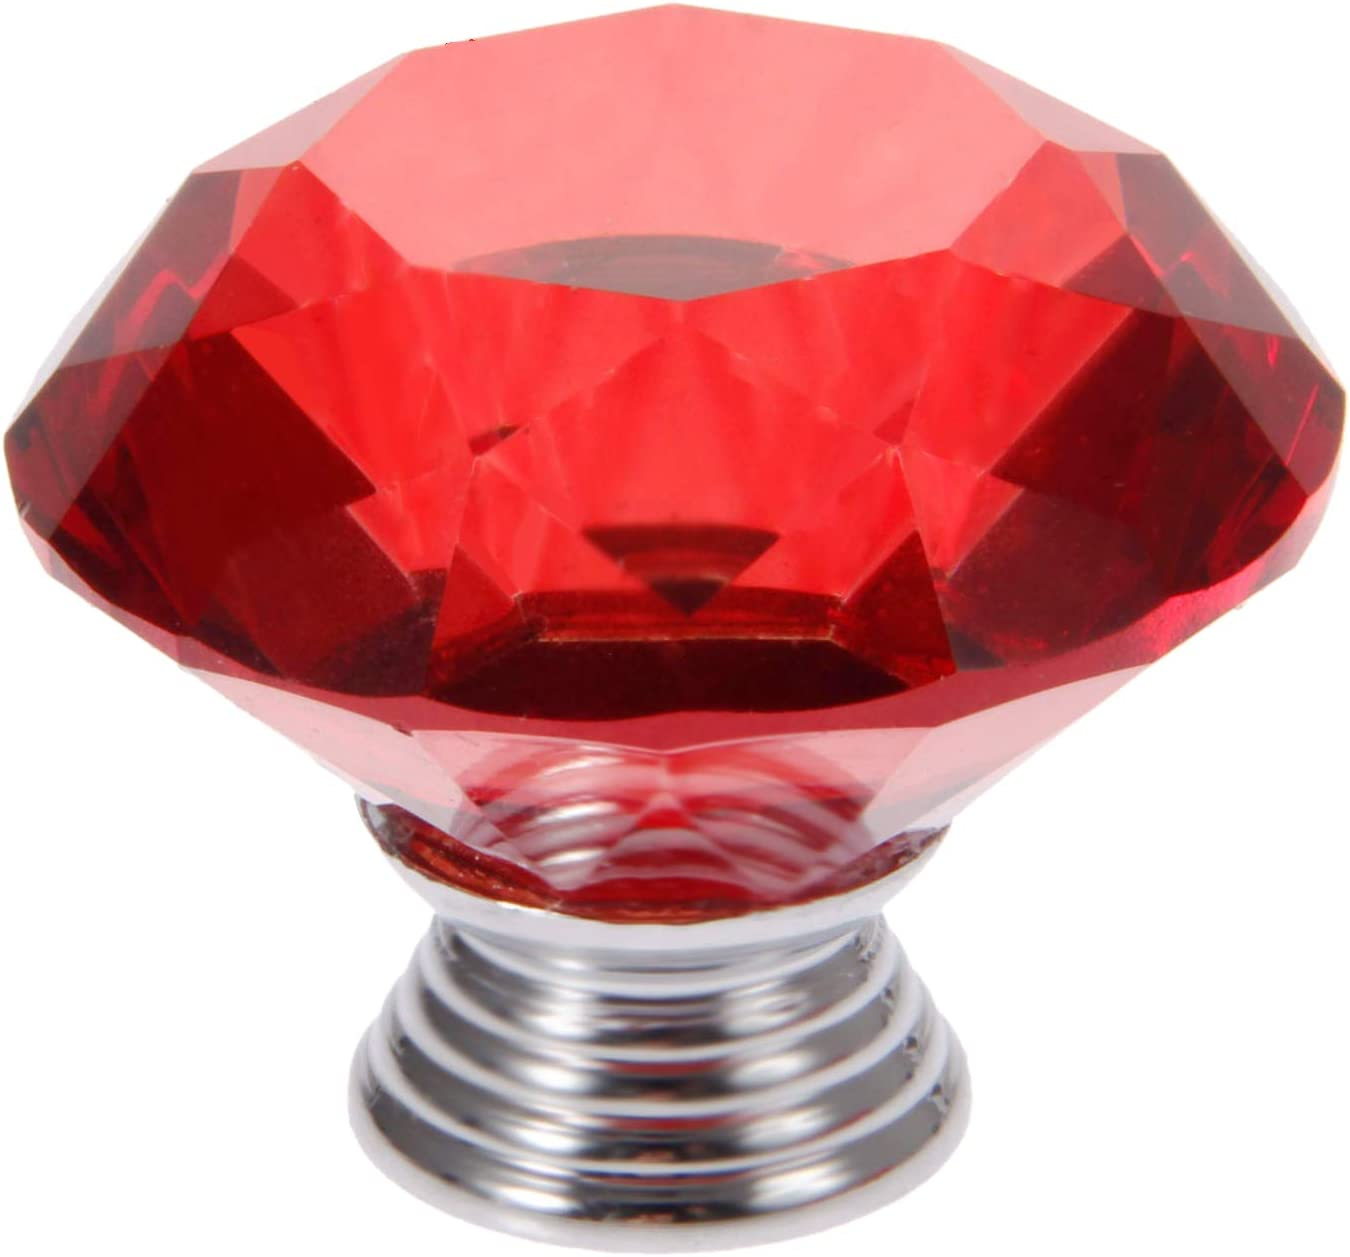 12pcs 40mm Diamond Crystal Glass Knob for Closet Cabinet Drawer Kitchen Dresser Cupboard Wardrobe,3 Size Screws,Black Mtsooning